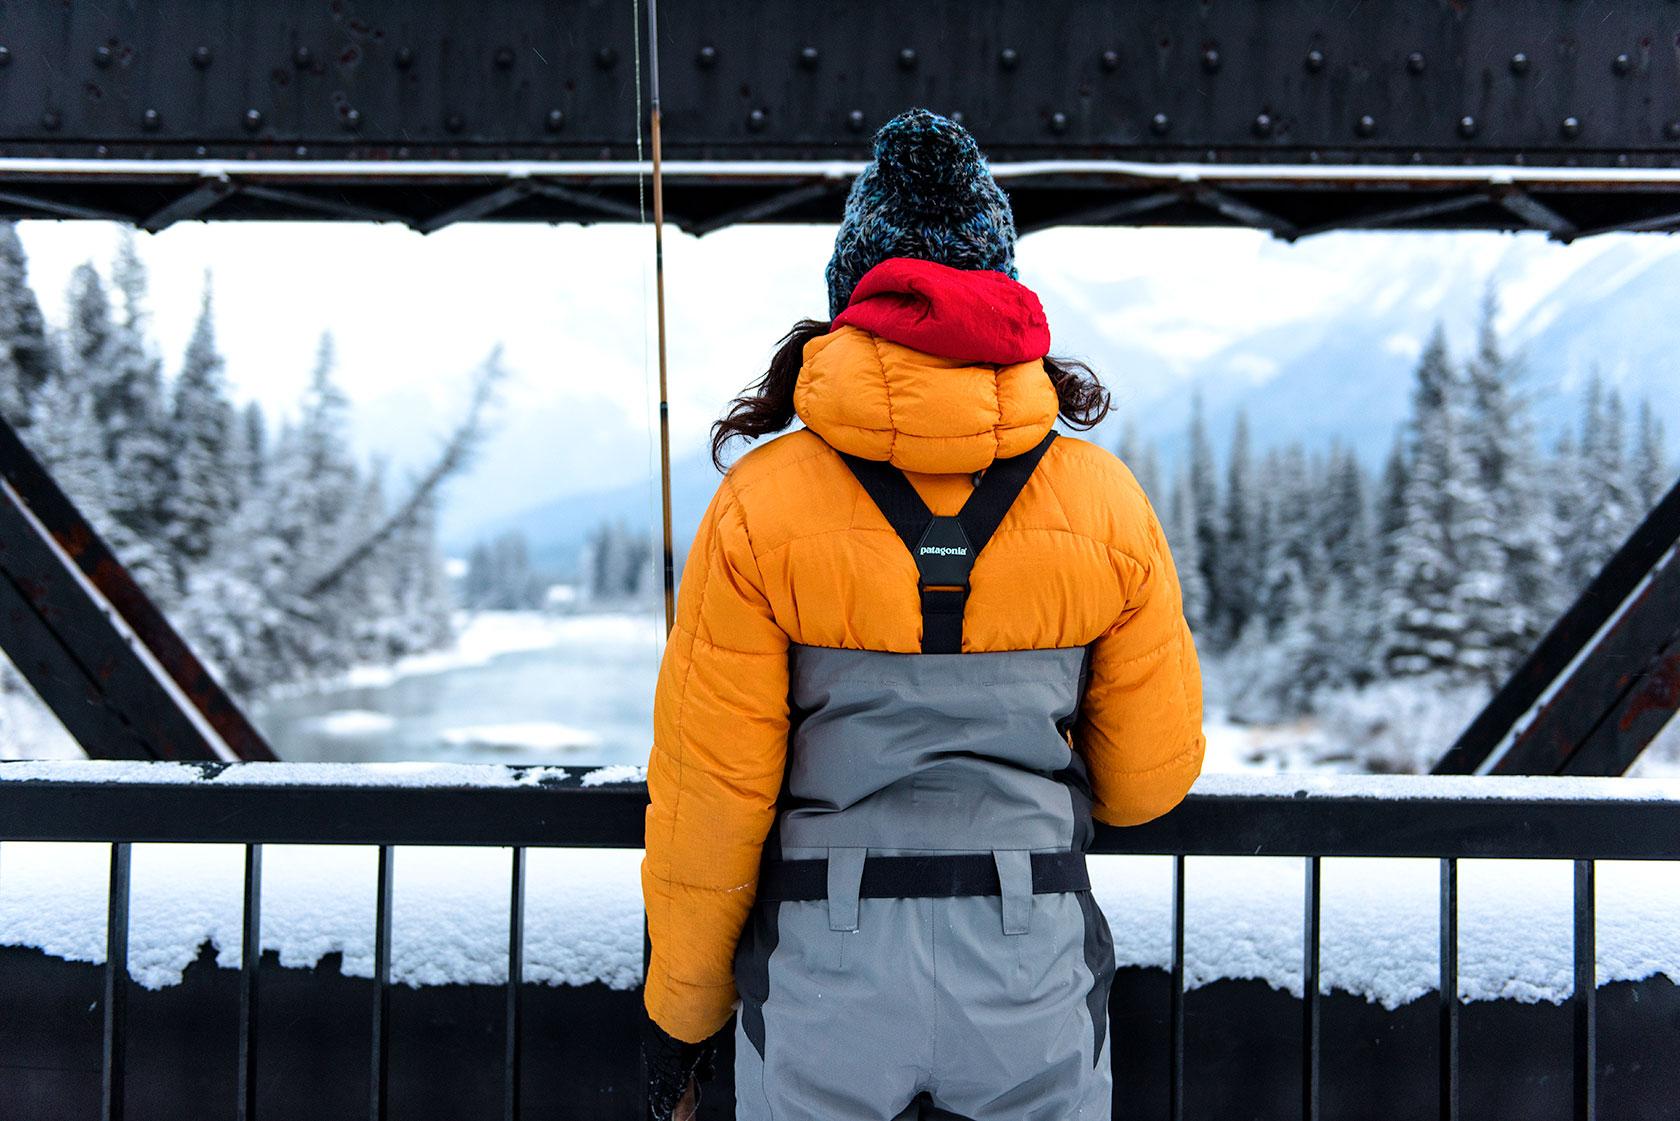 austin-trigg-patagonia-banff-alberta-winter-canada-lifestyle-adventure-mountains-canmore-bow-river-bridge.jpg